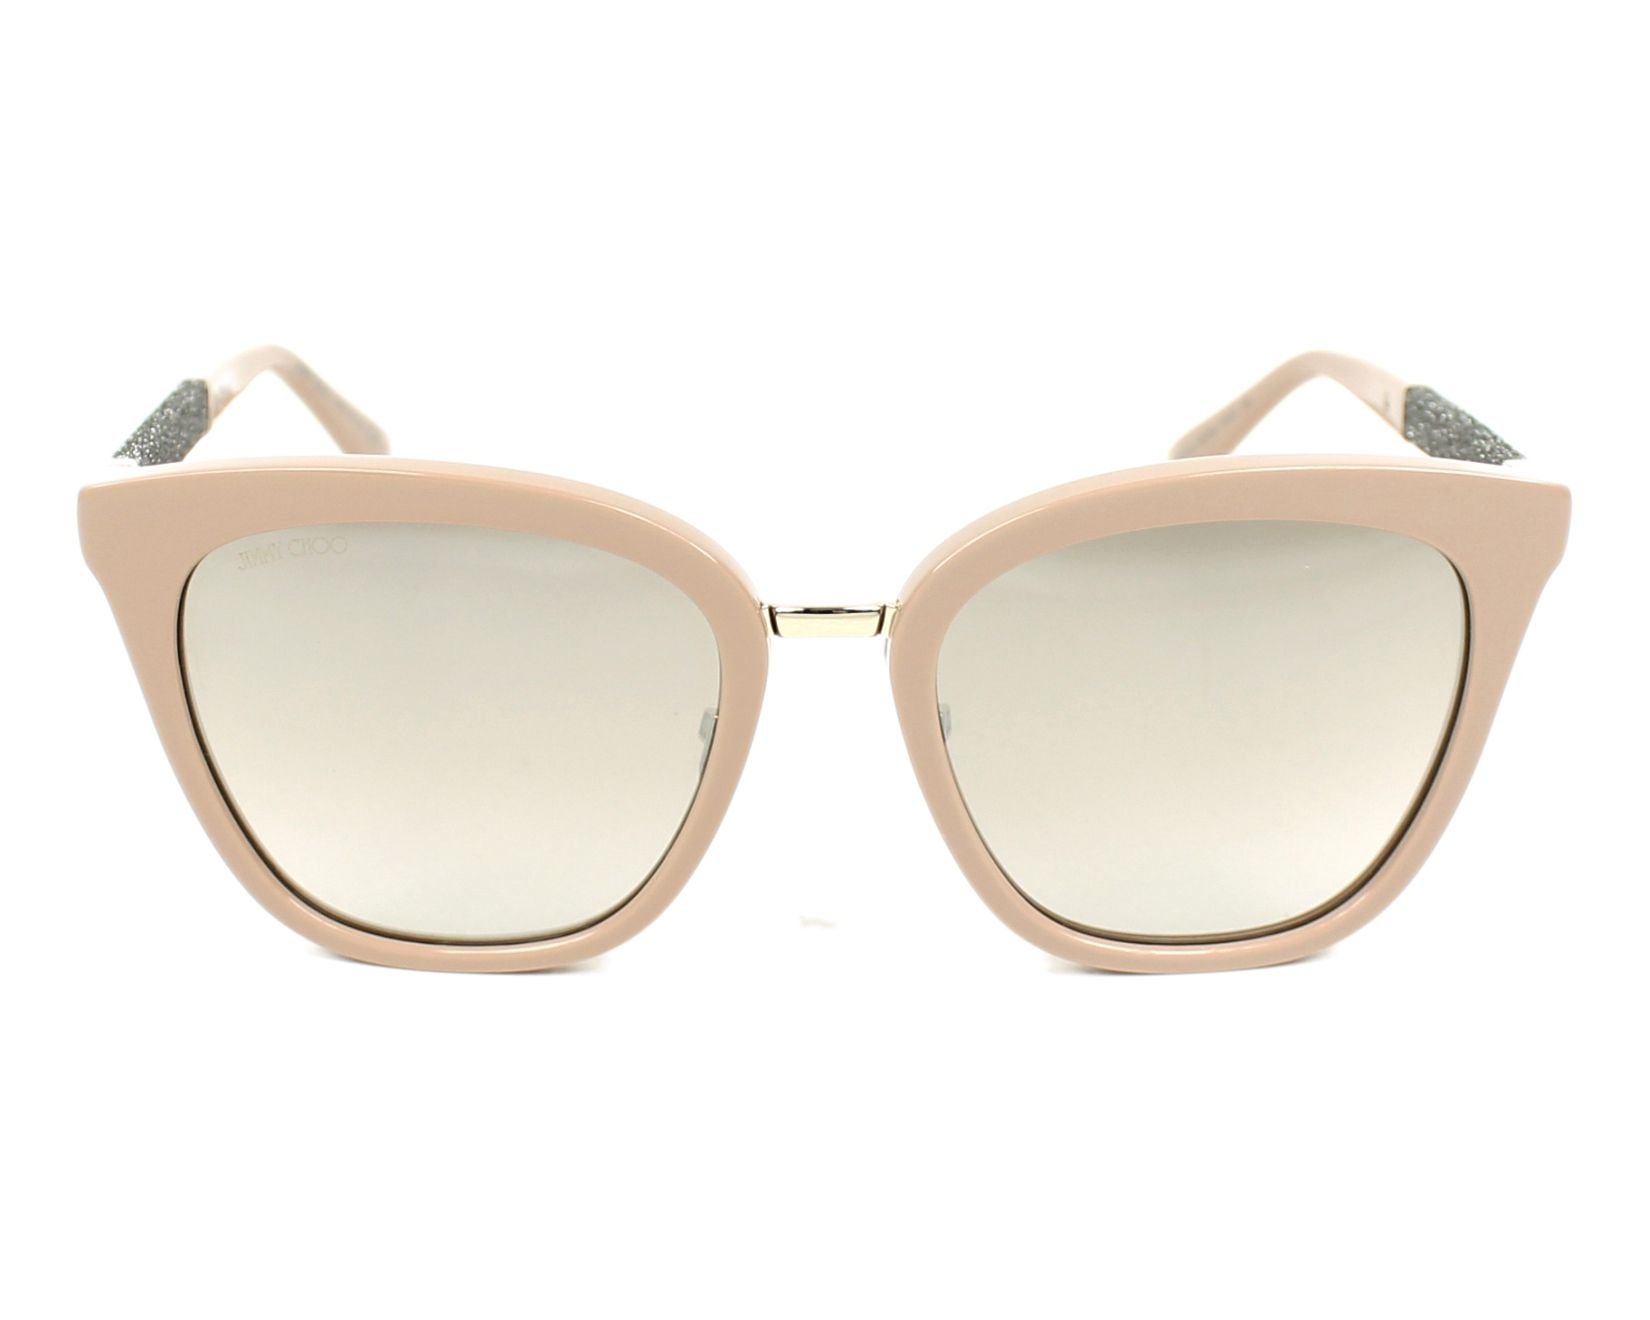 415d4ede19 thumbnail Sunglasses Jimmy Choo FABRY-S KDZ NQ - Beige Silver front view